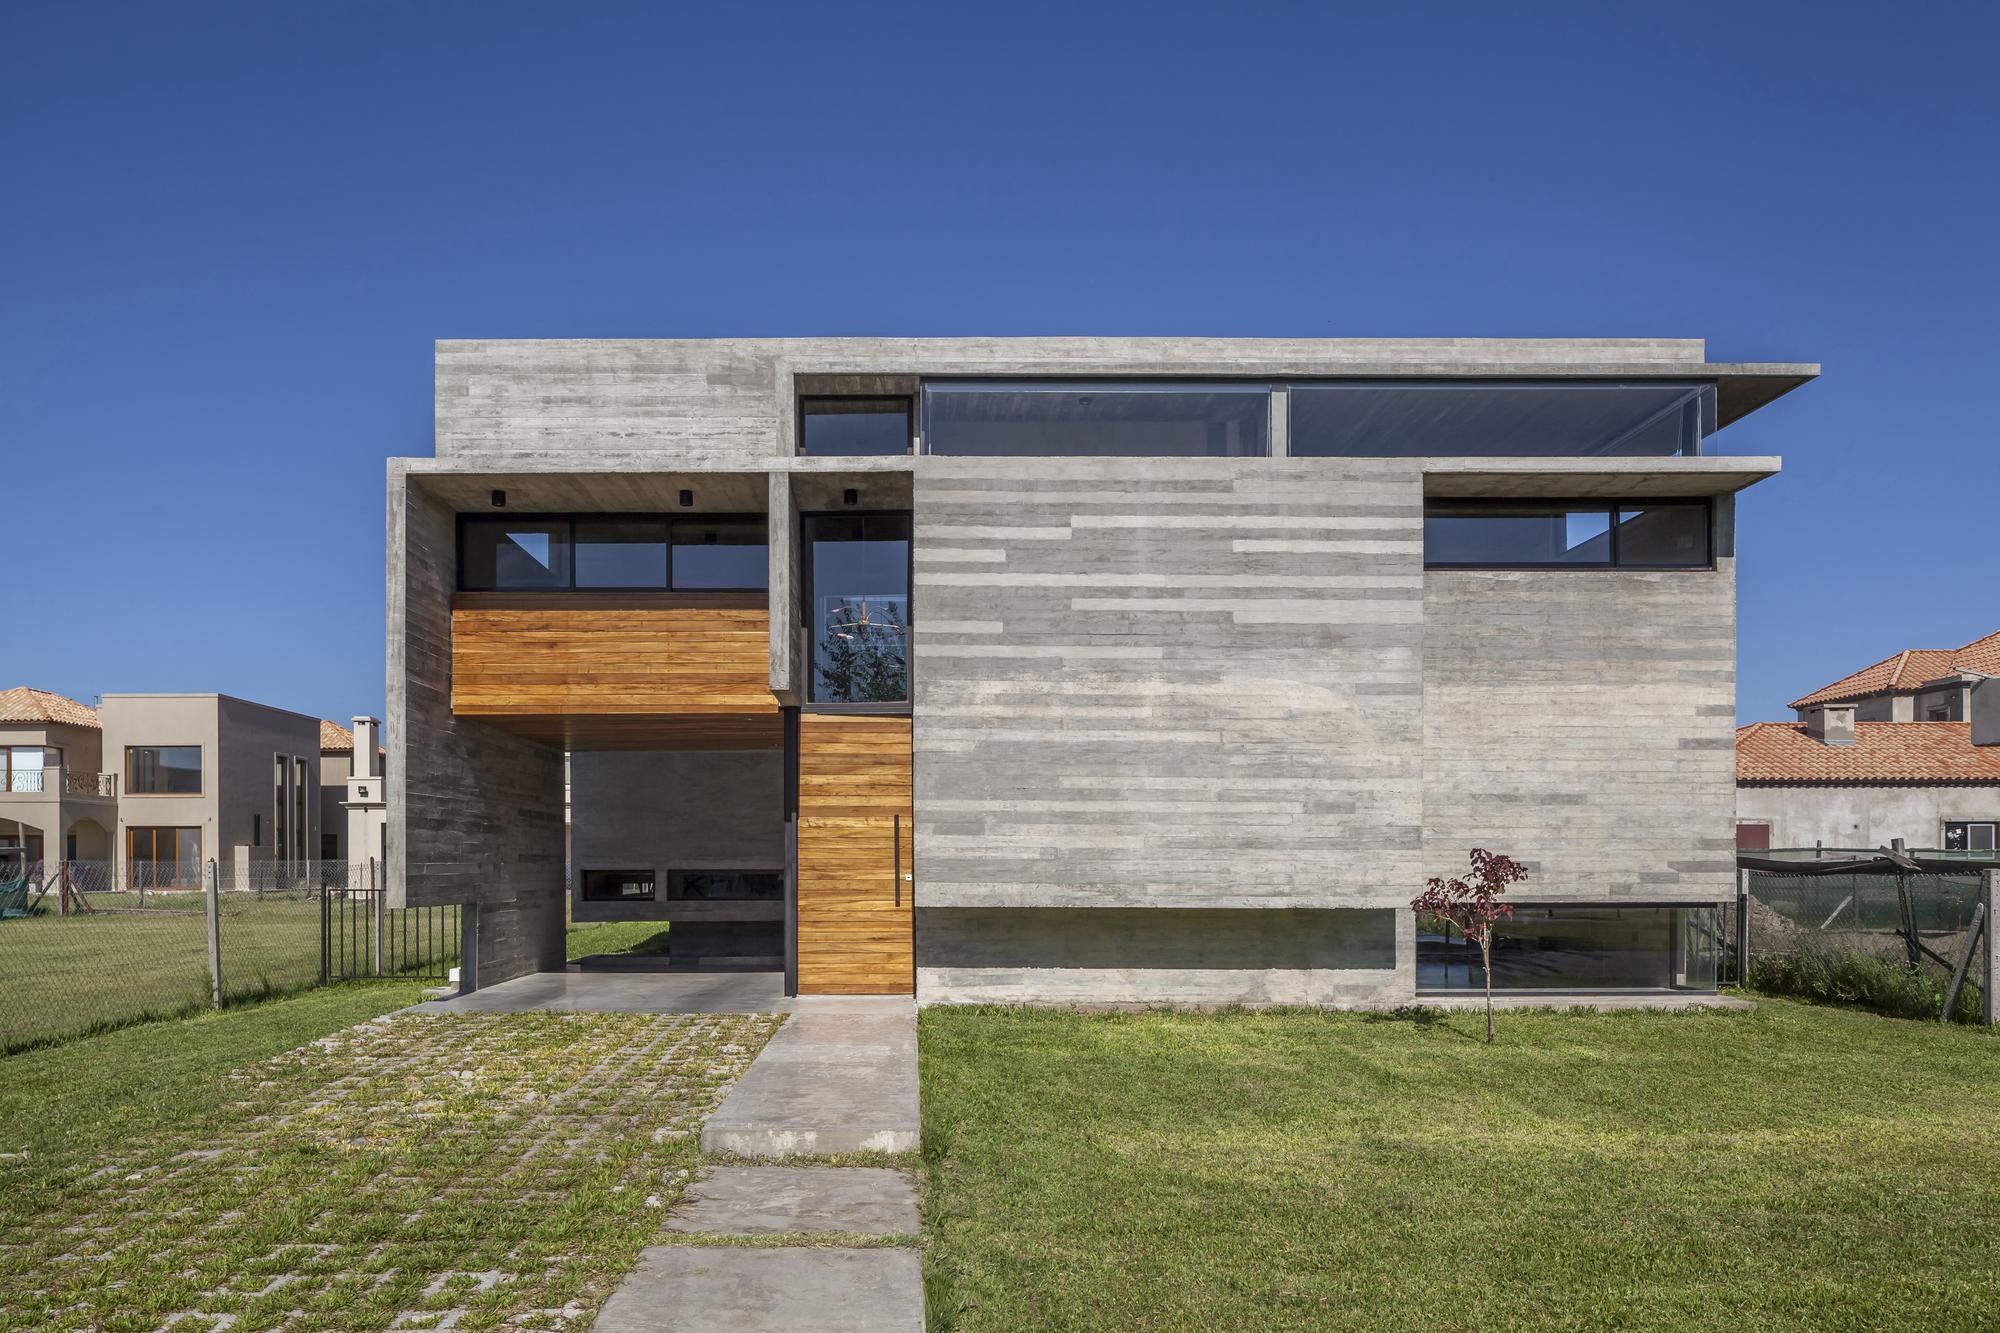 estudios de arquitectura en uruguay berazategui house beson as almeida arquitectos archdaily